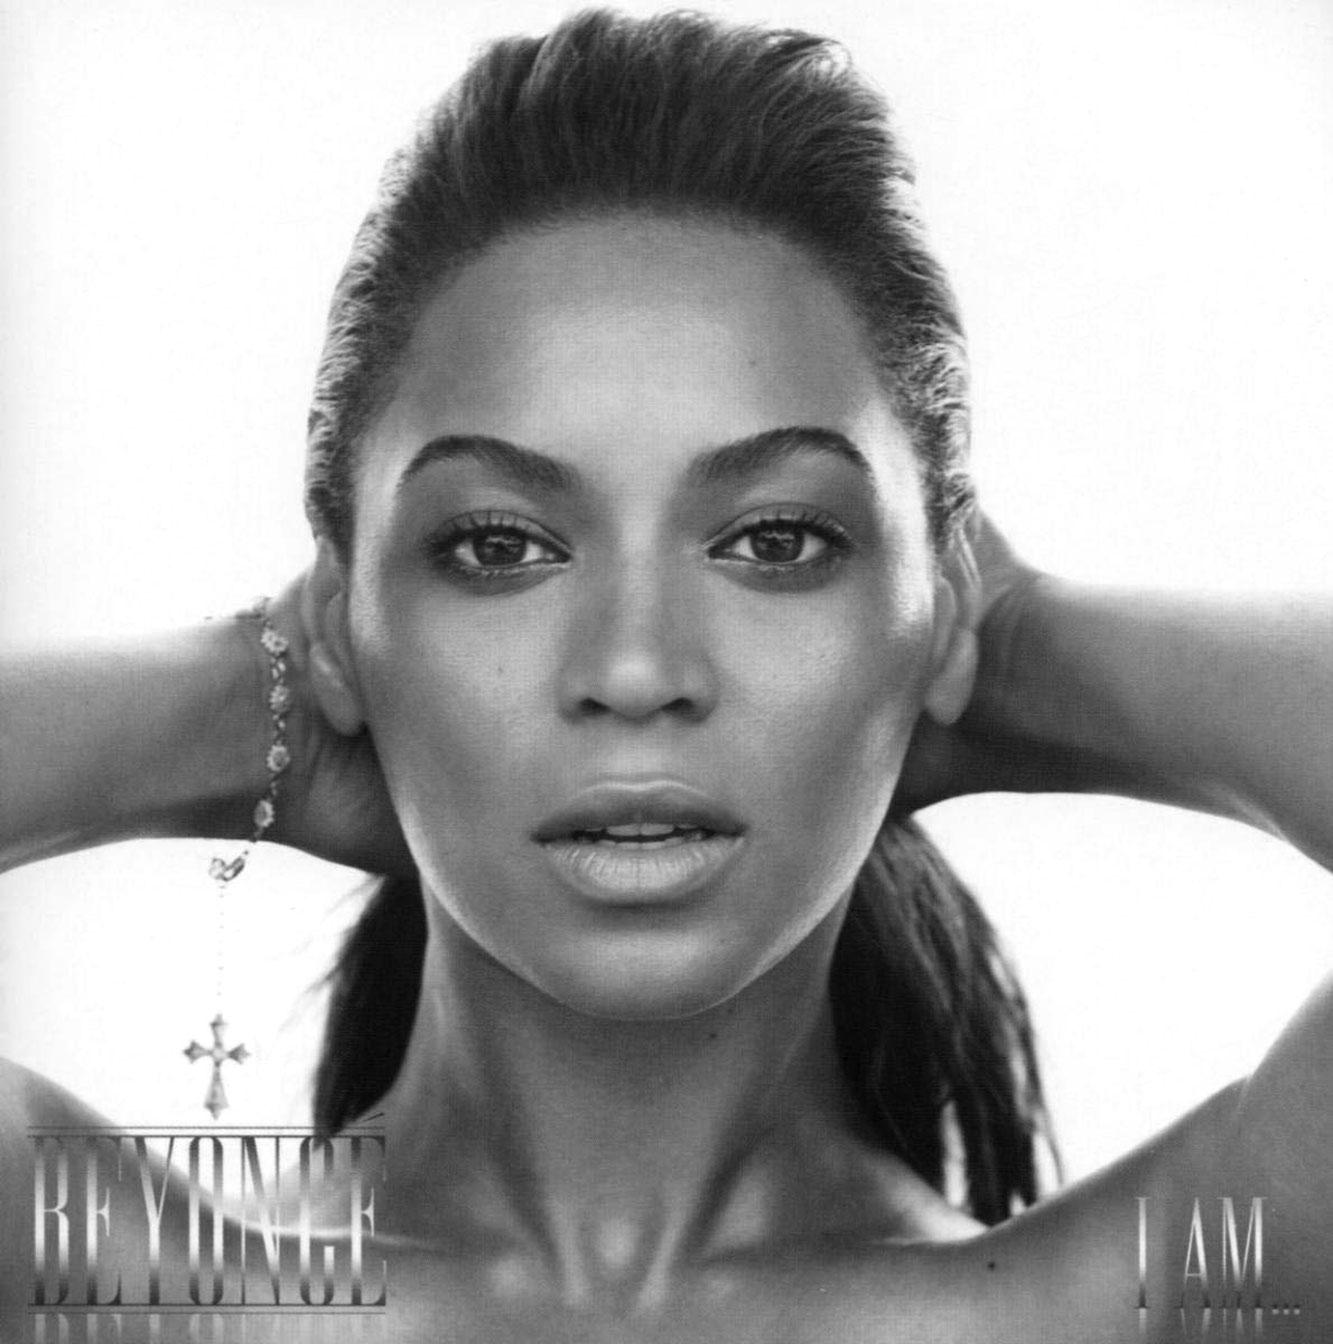 I am Sasha Fierce by Beyonce